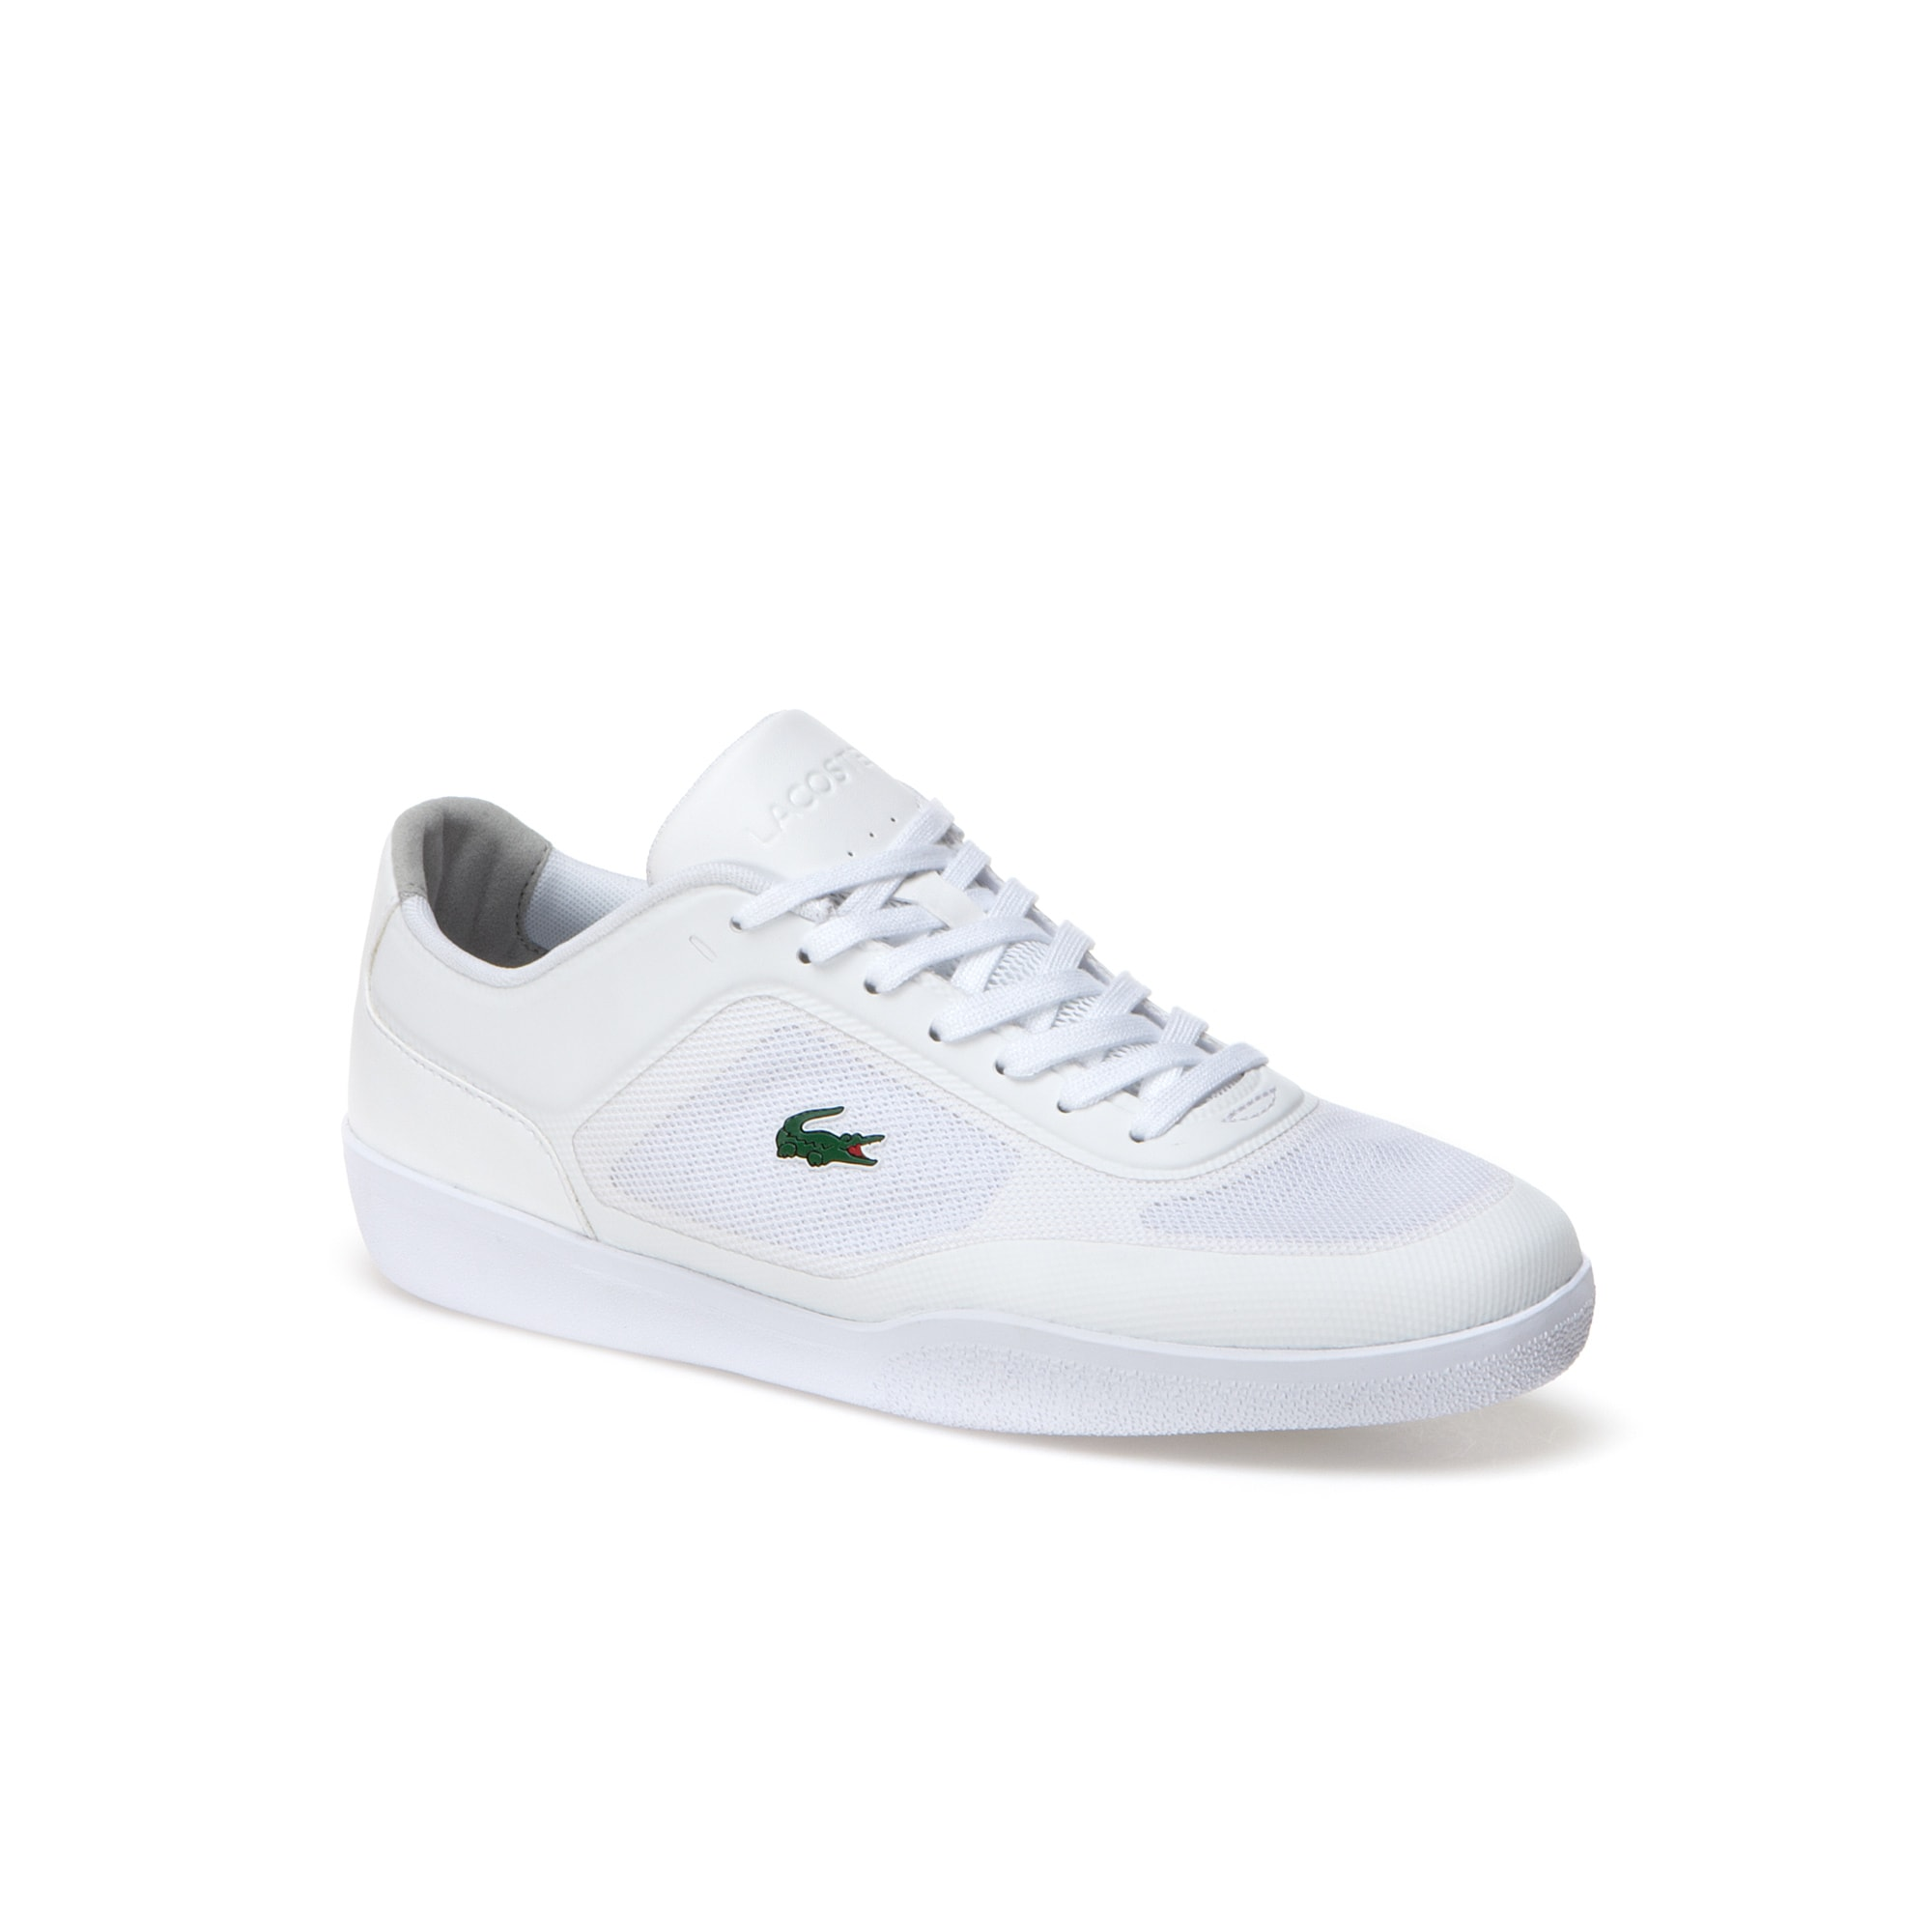 Men's Tramline Sneakers